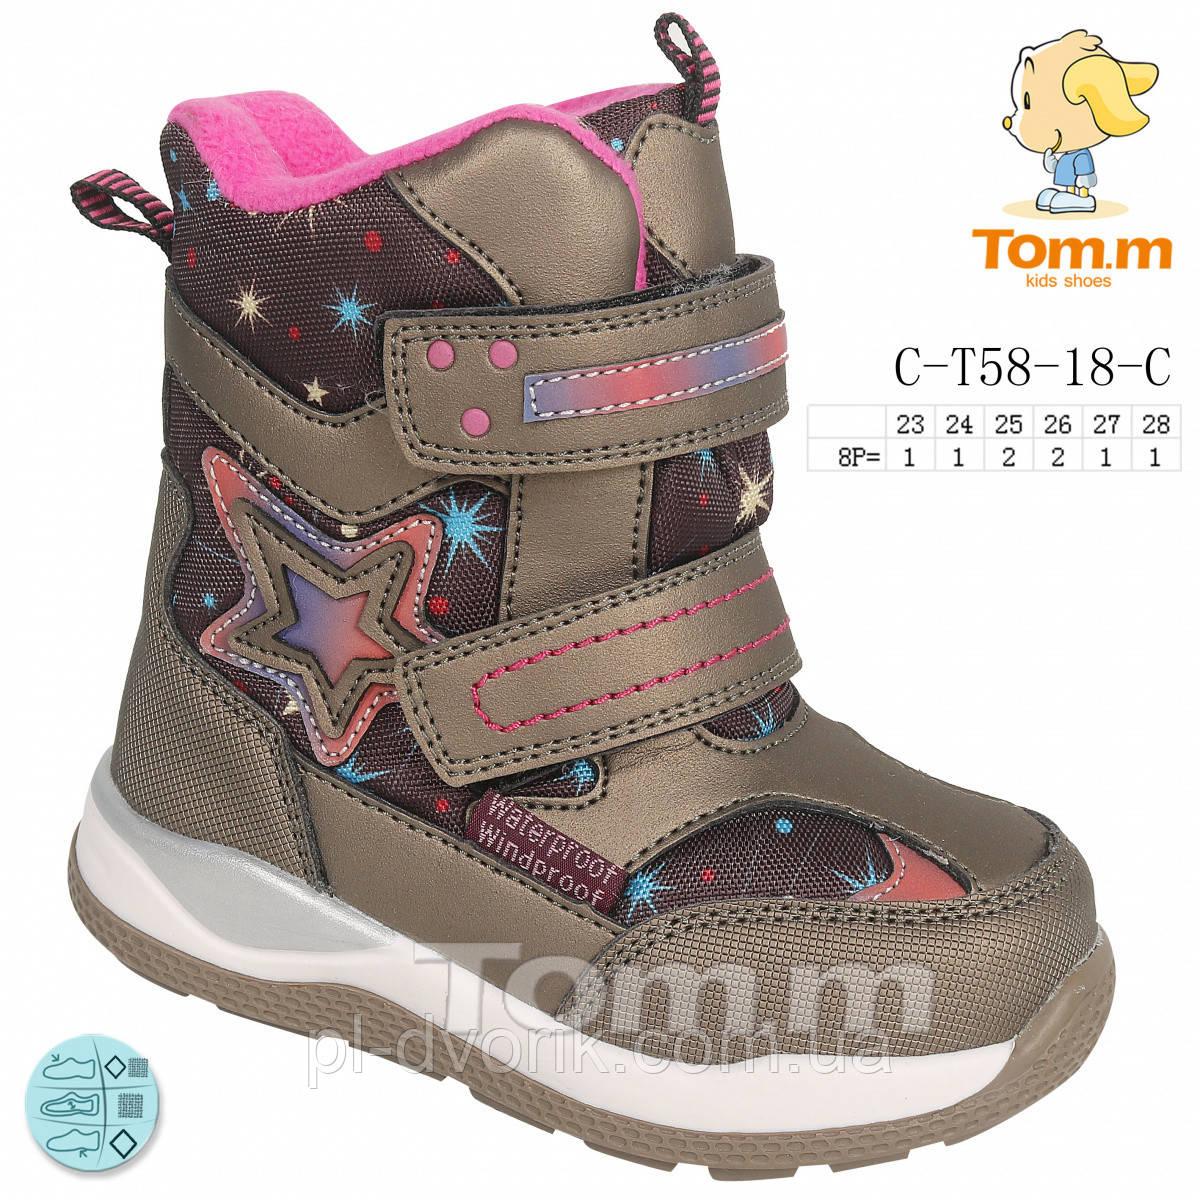 Термо  5818C Tom.M /  Девочка  Размер 24. 26 Цвет Бронза  Кол-во пар 8  Бренд Tom.M  Производитель Ки